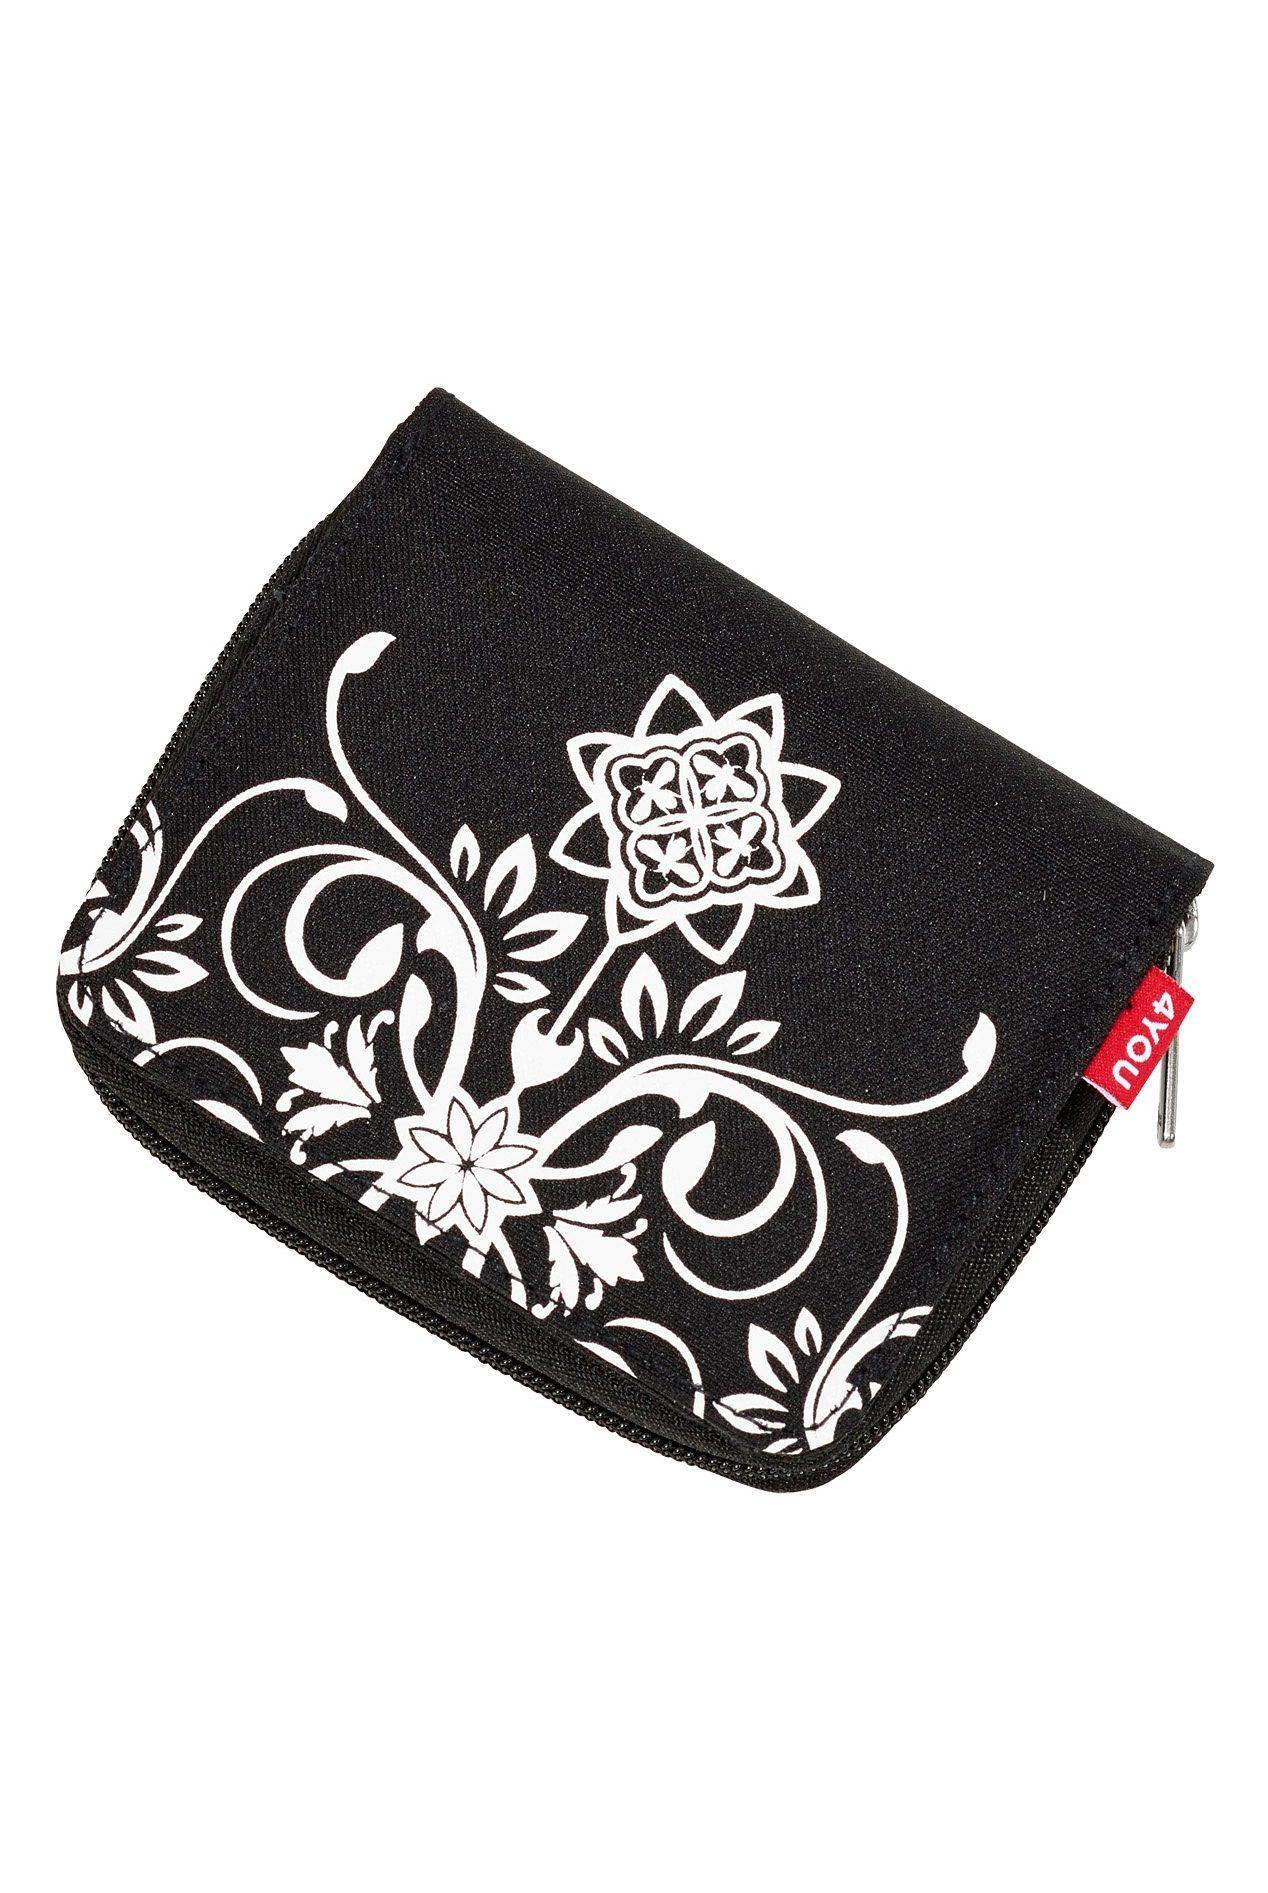 4YOU Geldbörse mit Reißverschluss, Bee Ornamental, »Zipper Wallet«